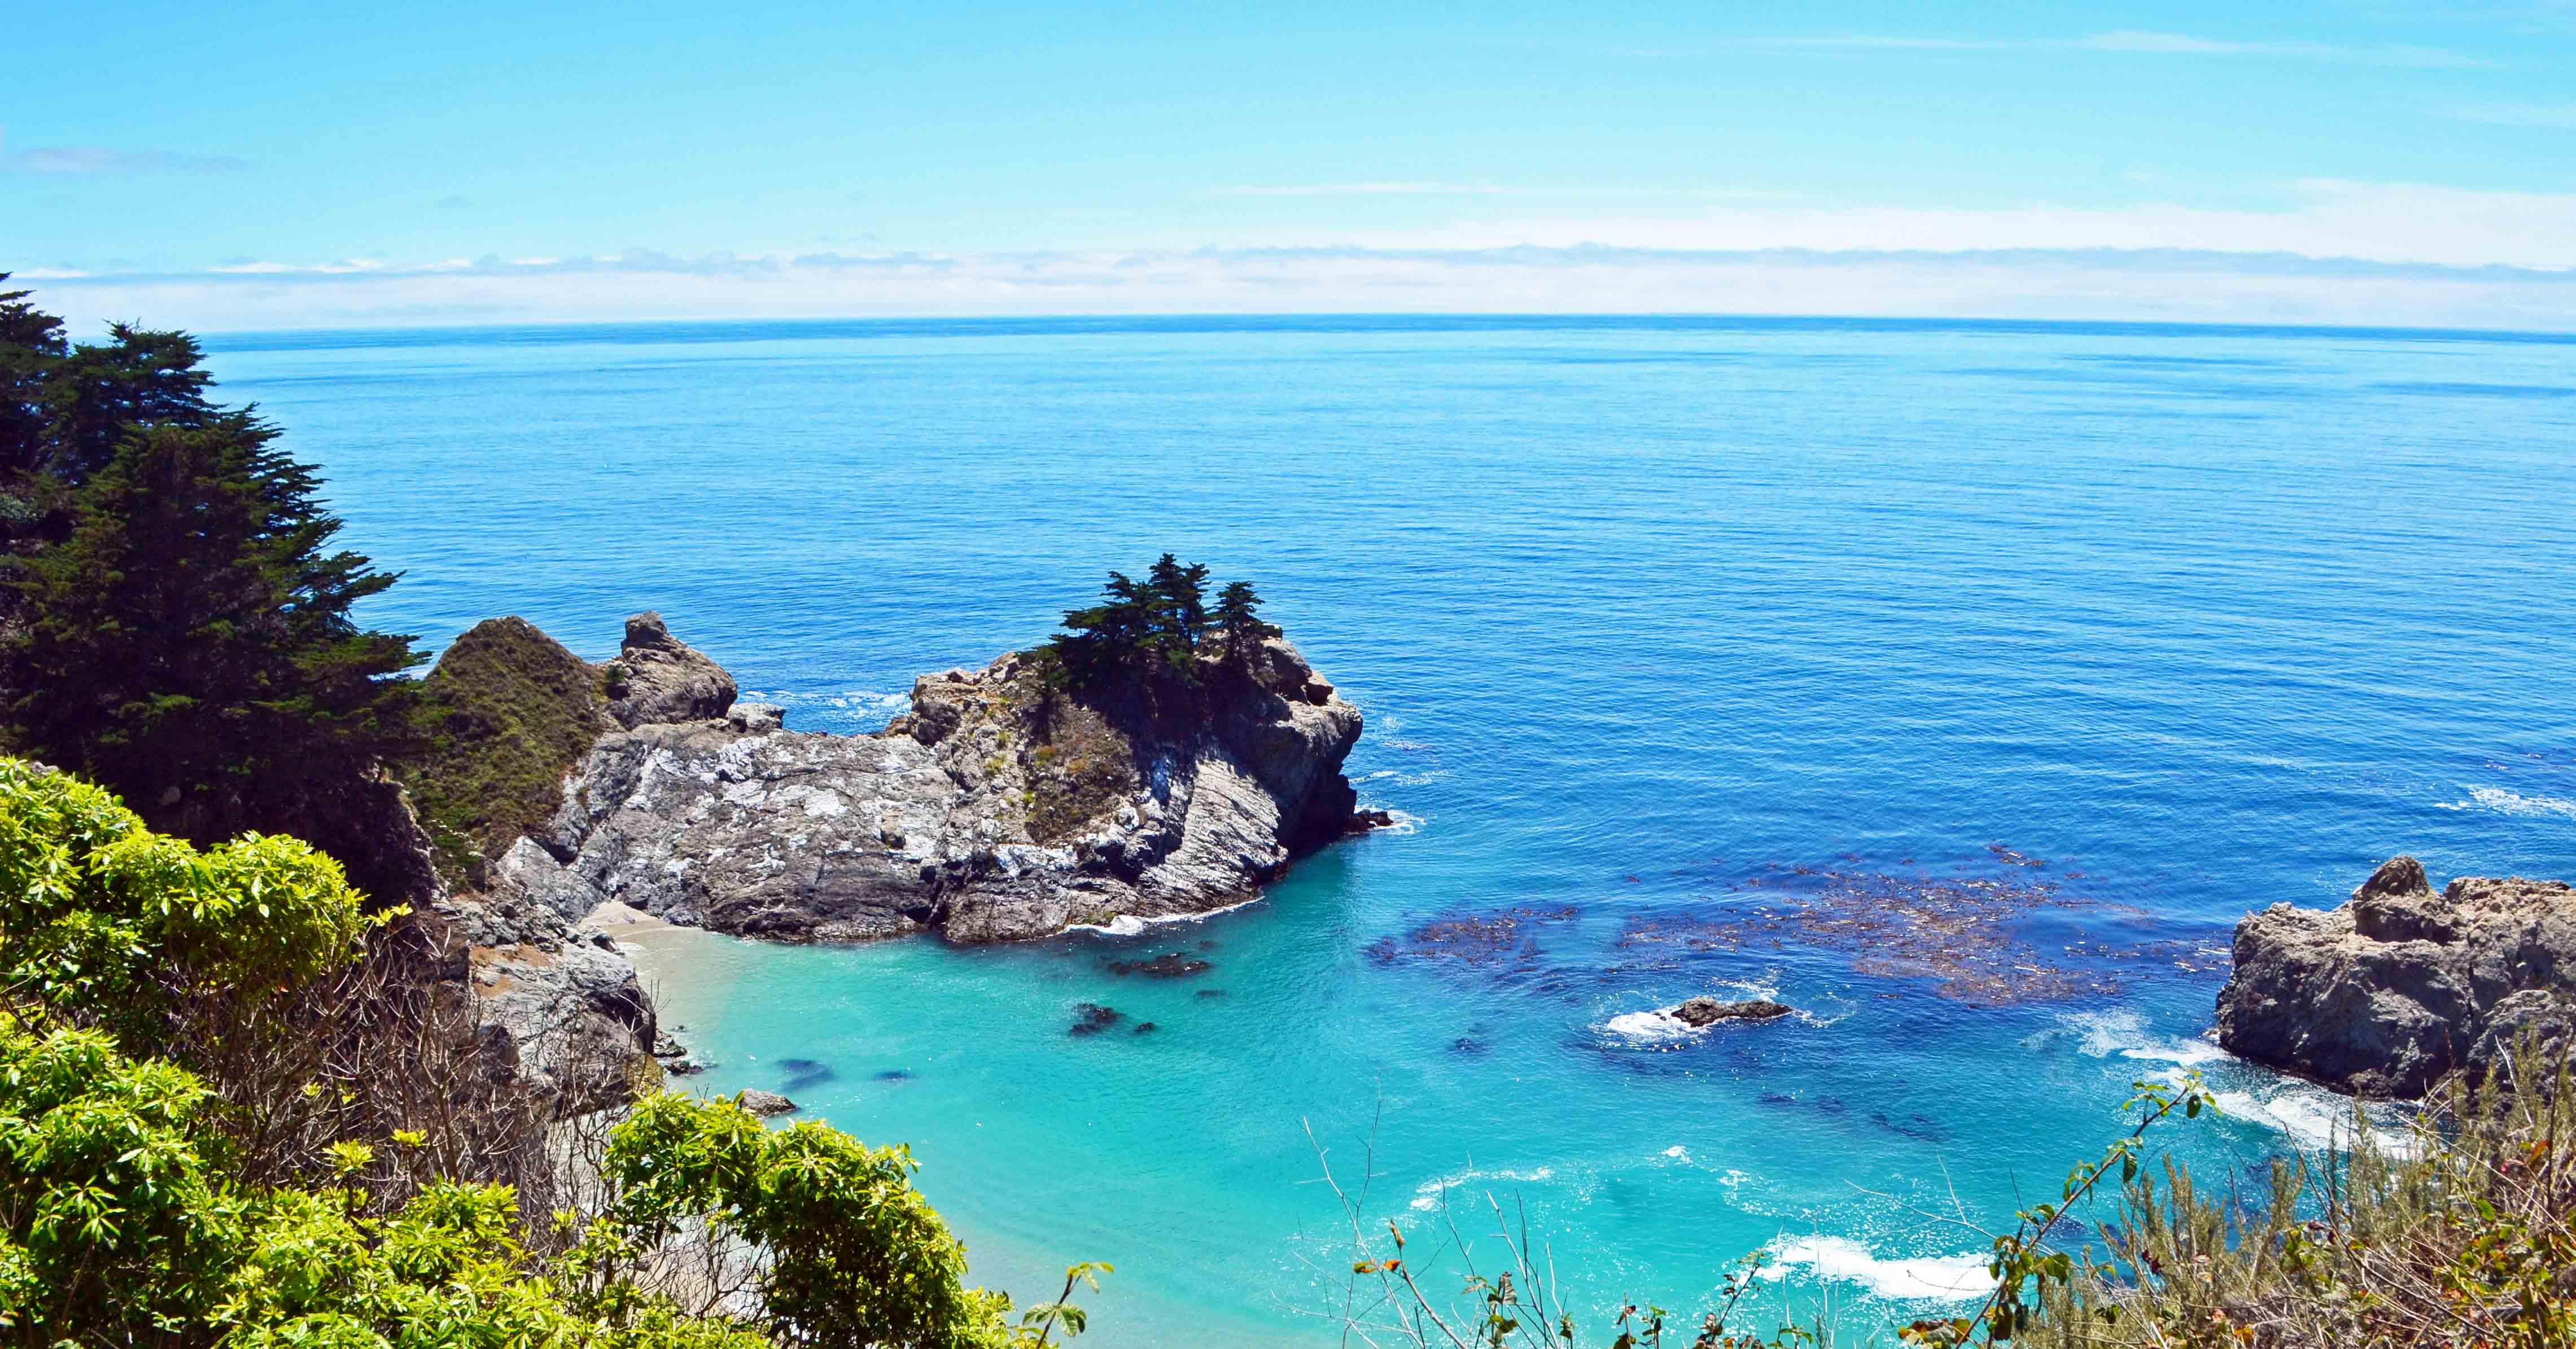 Big Sur California Pacific Coast Highway 1 Road Trip by Modern Honey. www.modernhoney.com